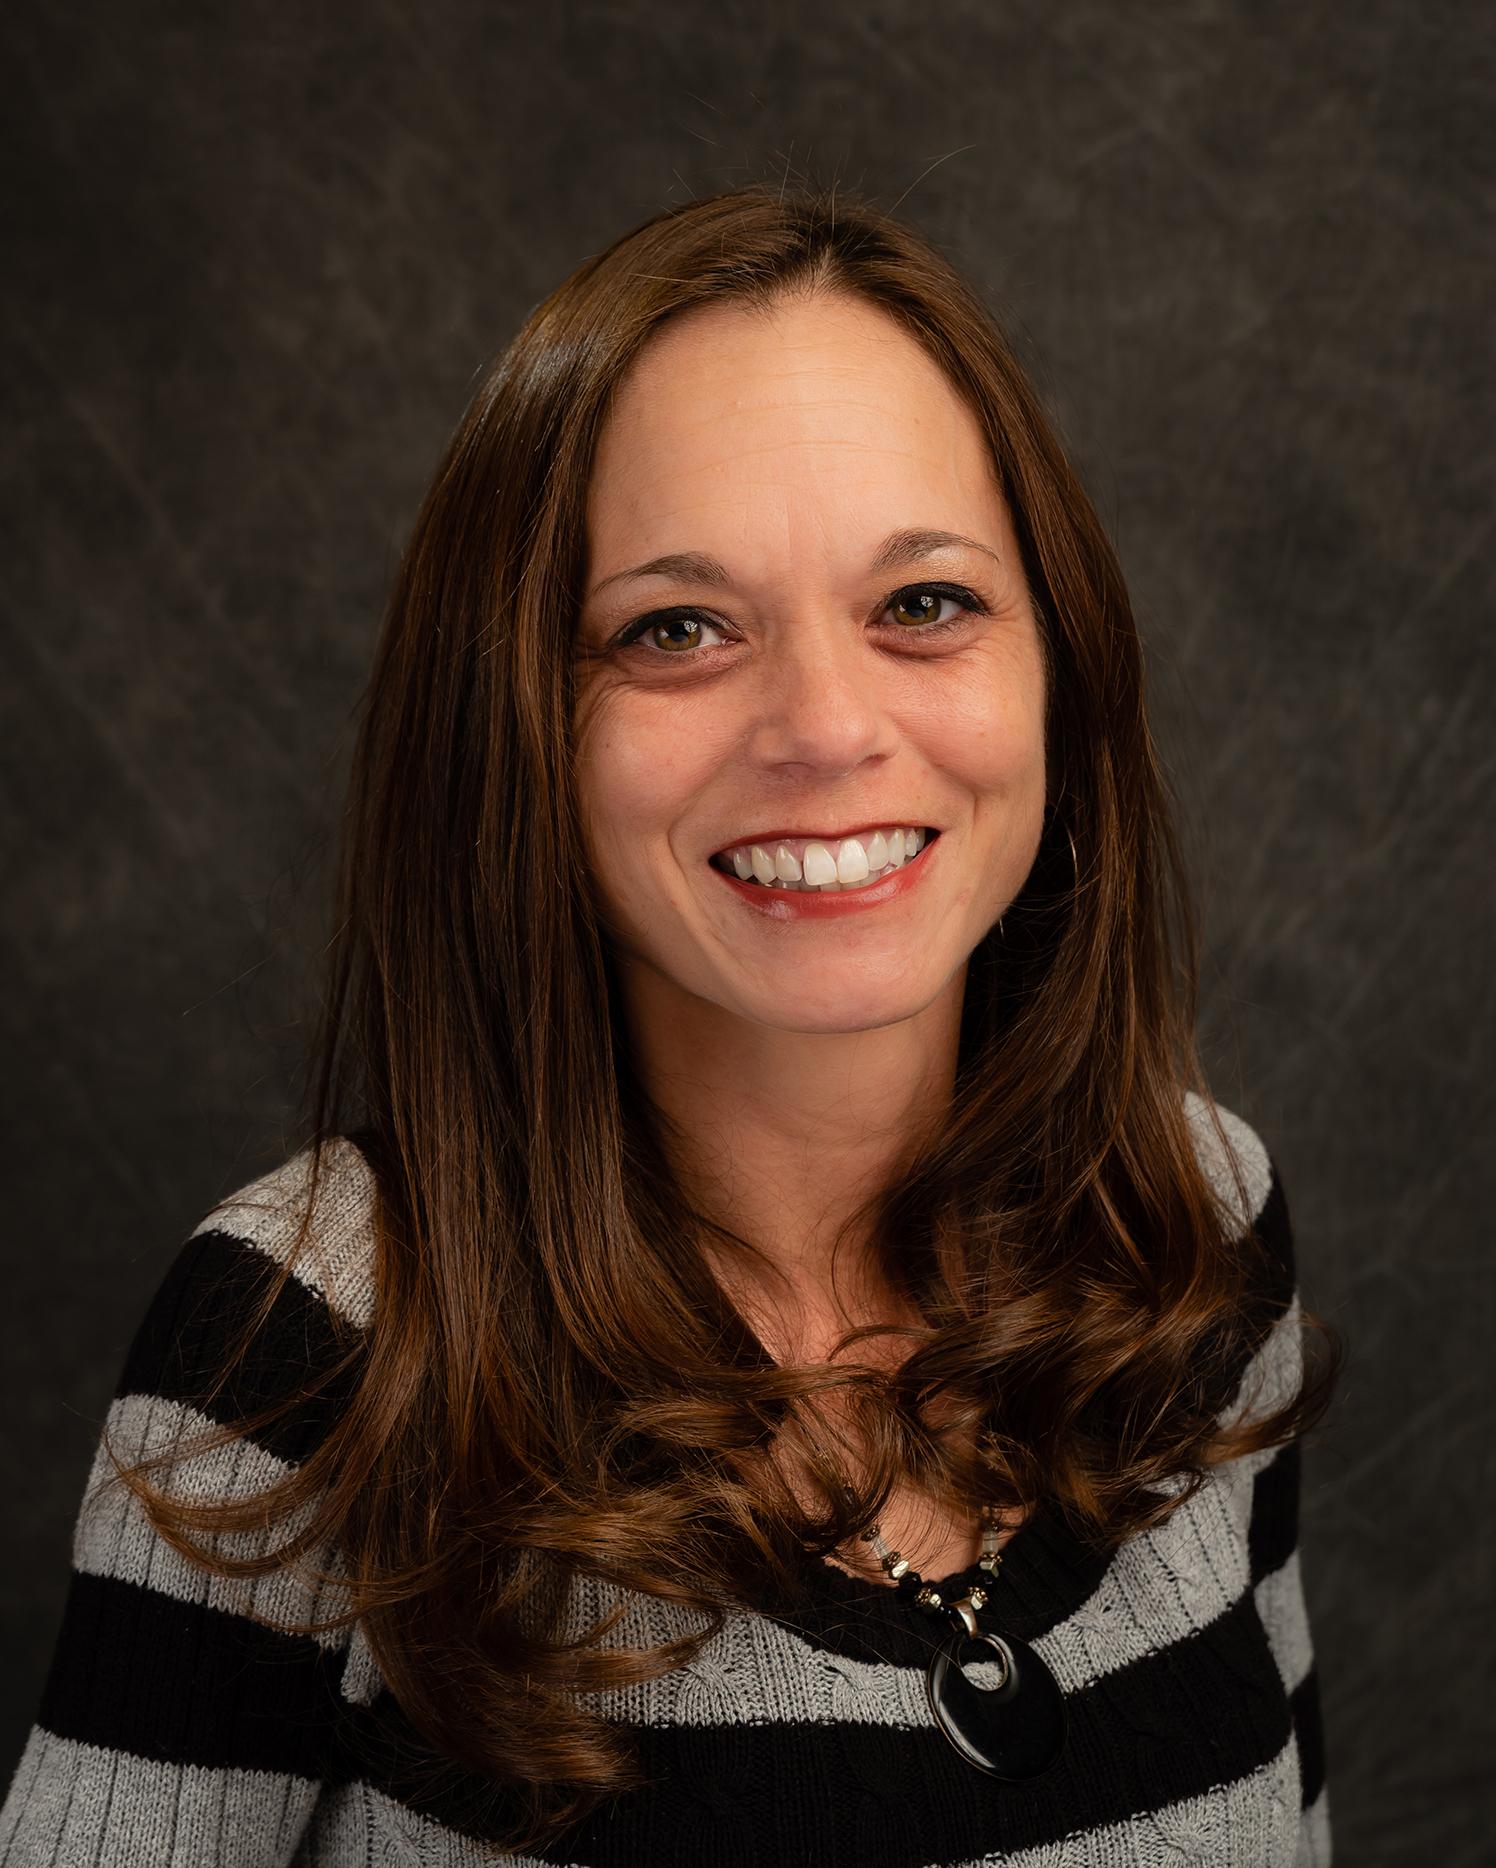 Rachelle Rich-Accountant & Payroll Clerk